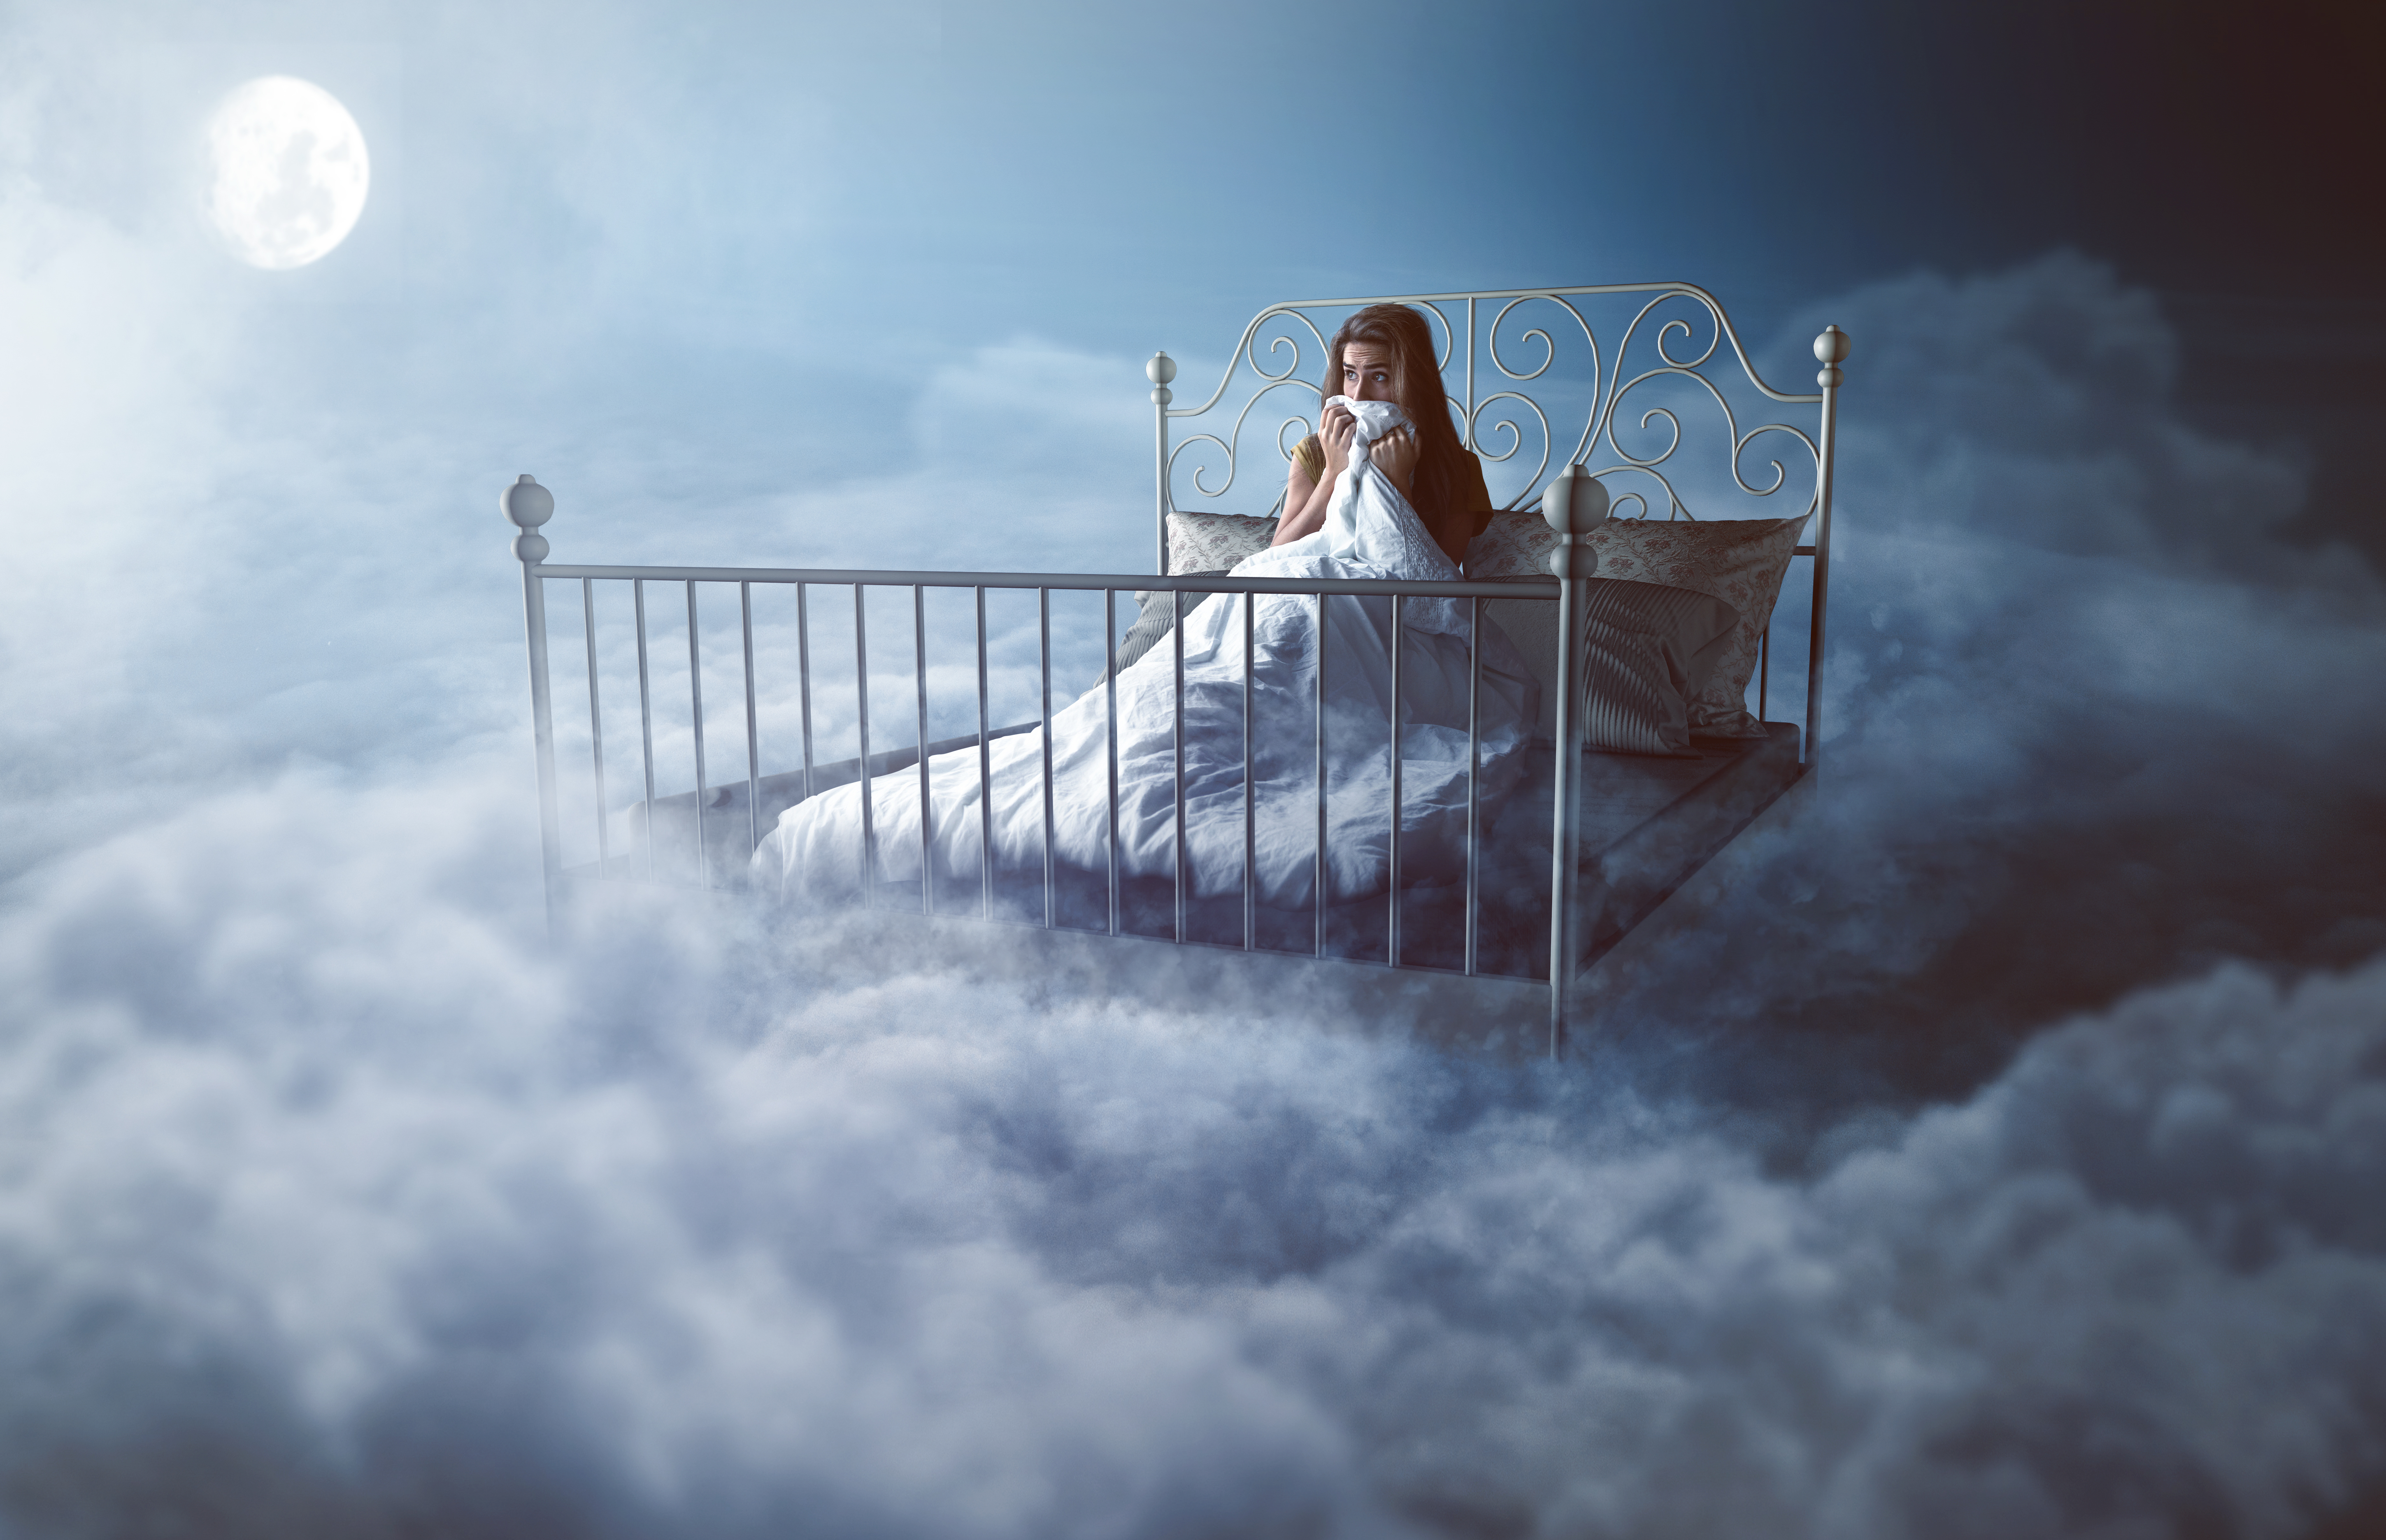 Картинка мечта не спит